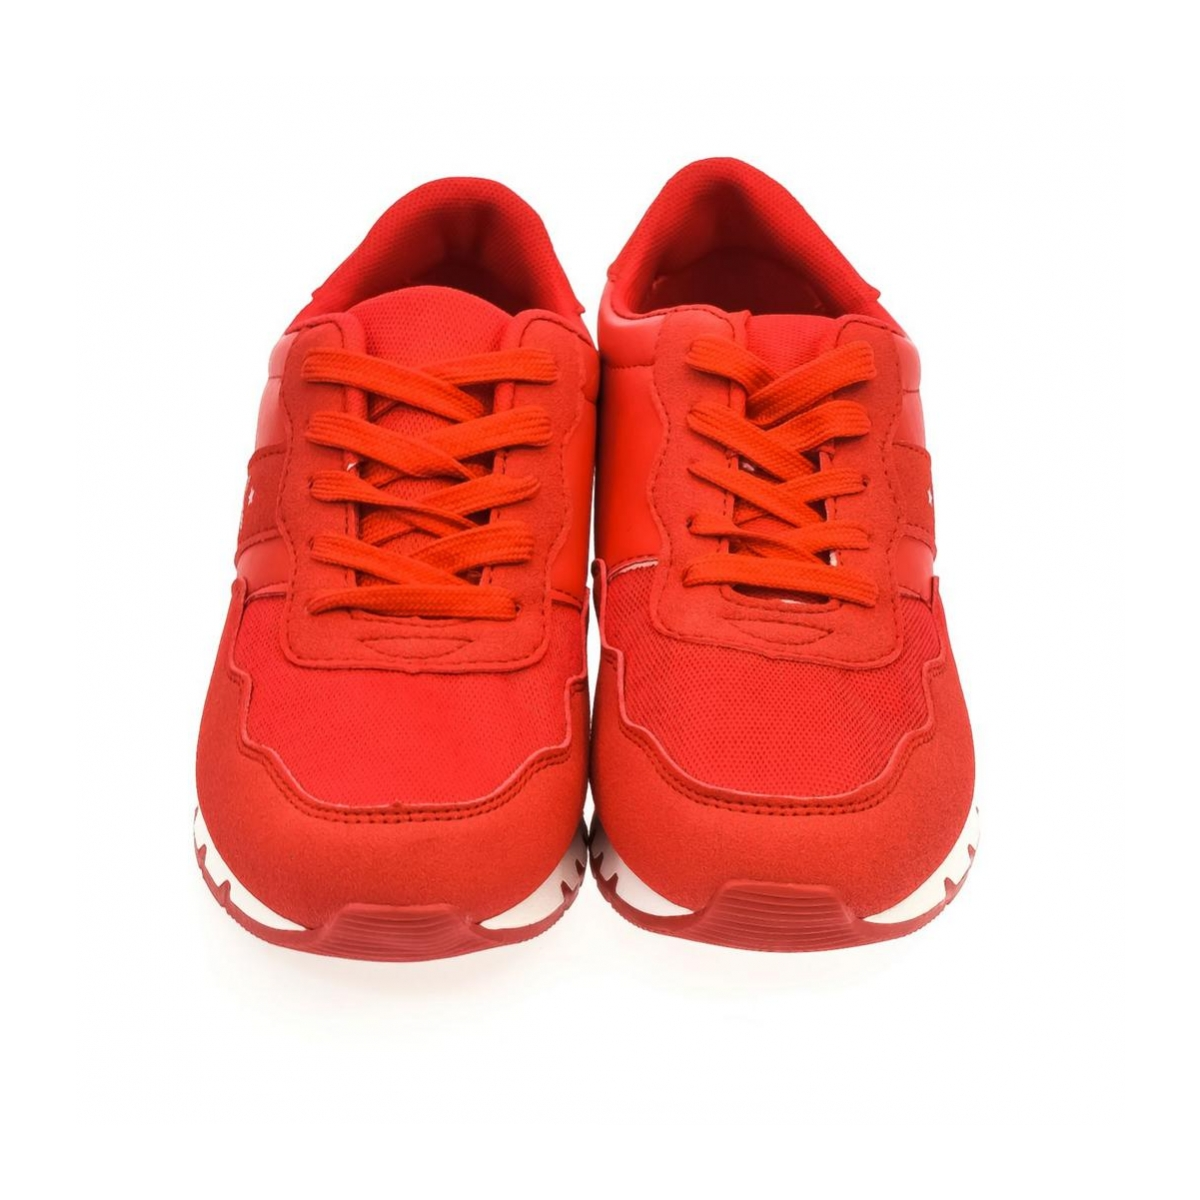 69ae6d5b9e Dámske červené tenisky MARI - 2